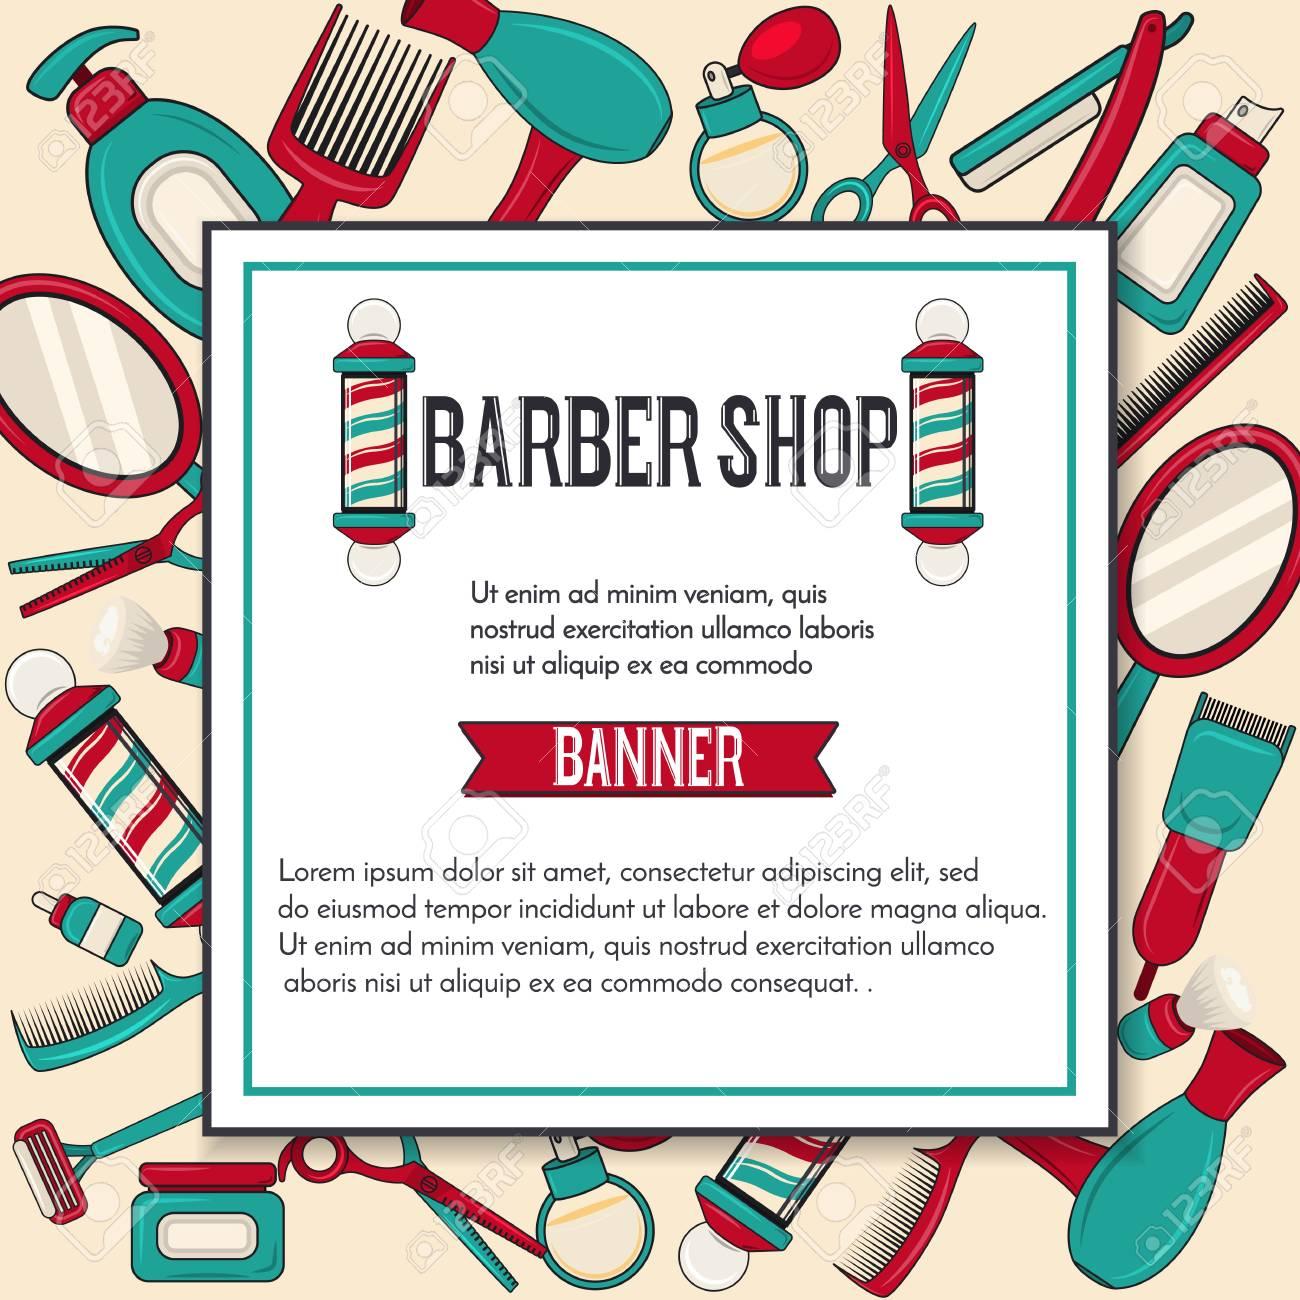 Vintage Barbershop Vector Banner Design With Man Brooming Equipments Mirror Scissors Barber Pole